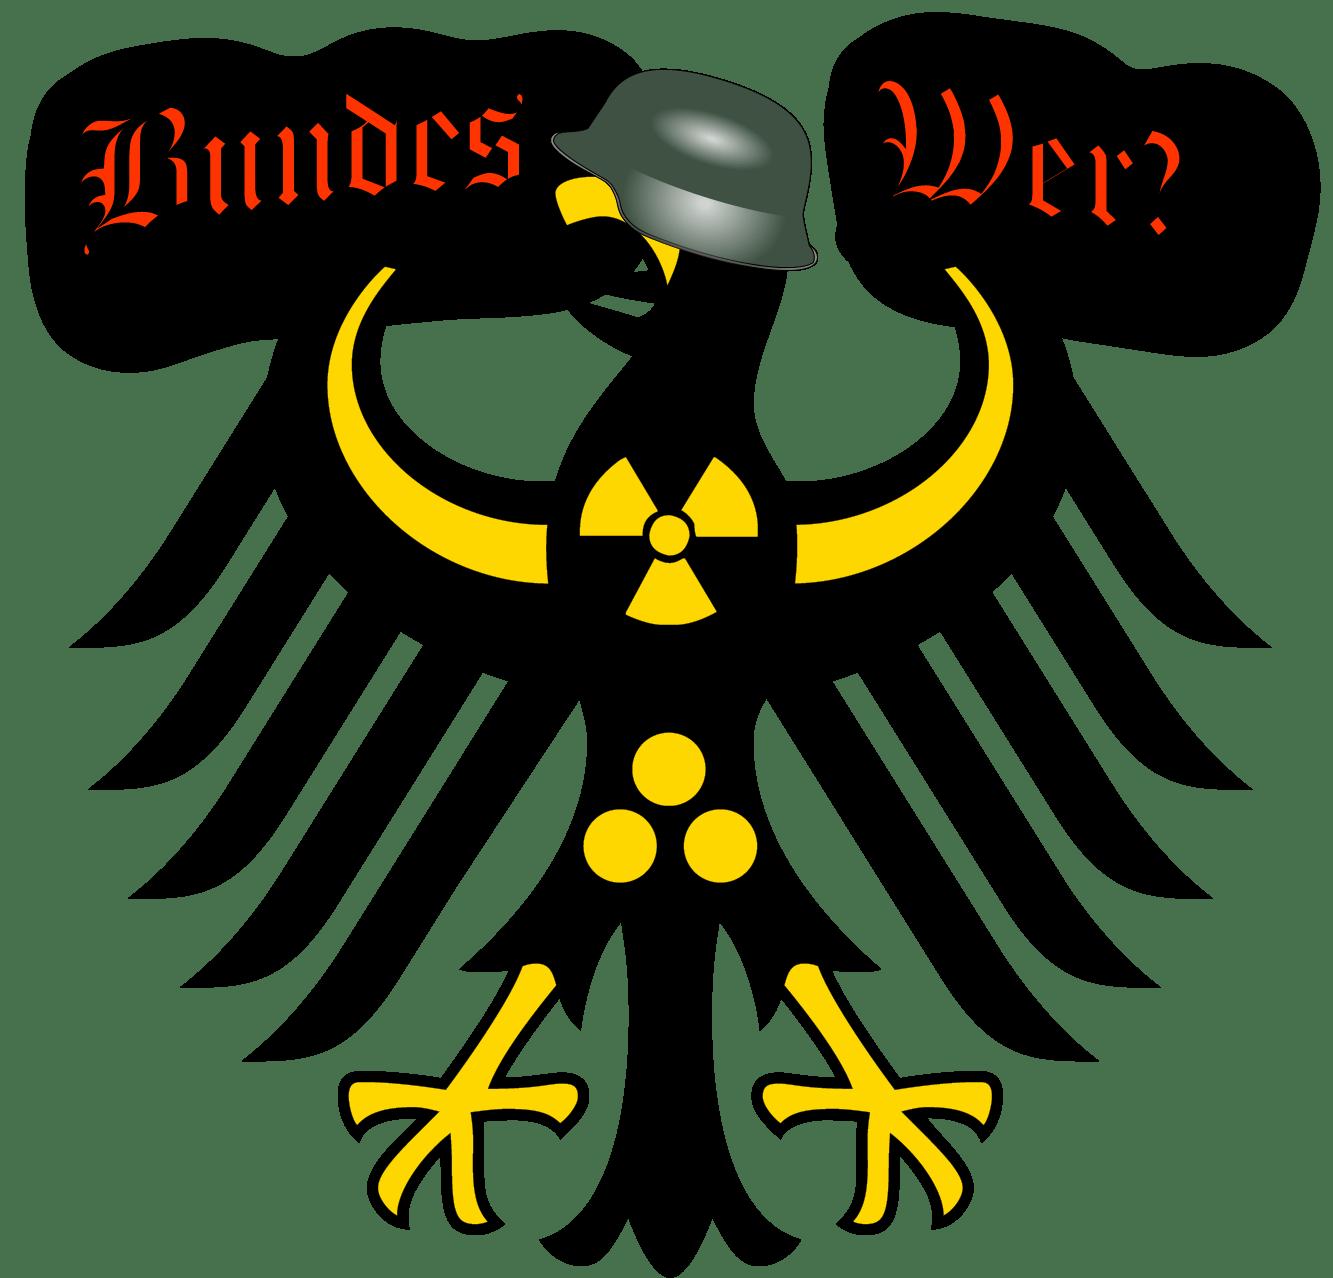 Kampf Bundesadler new german power